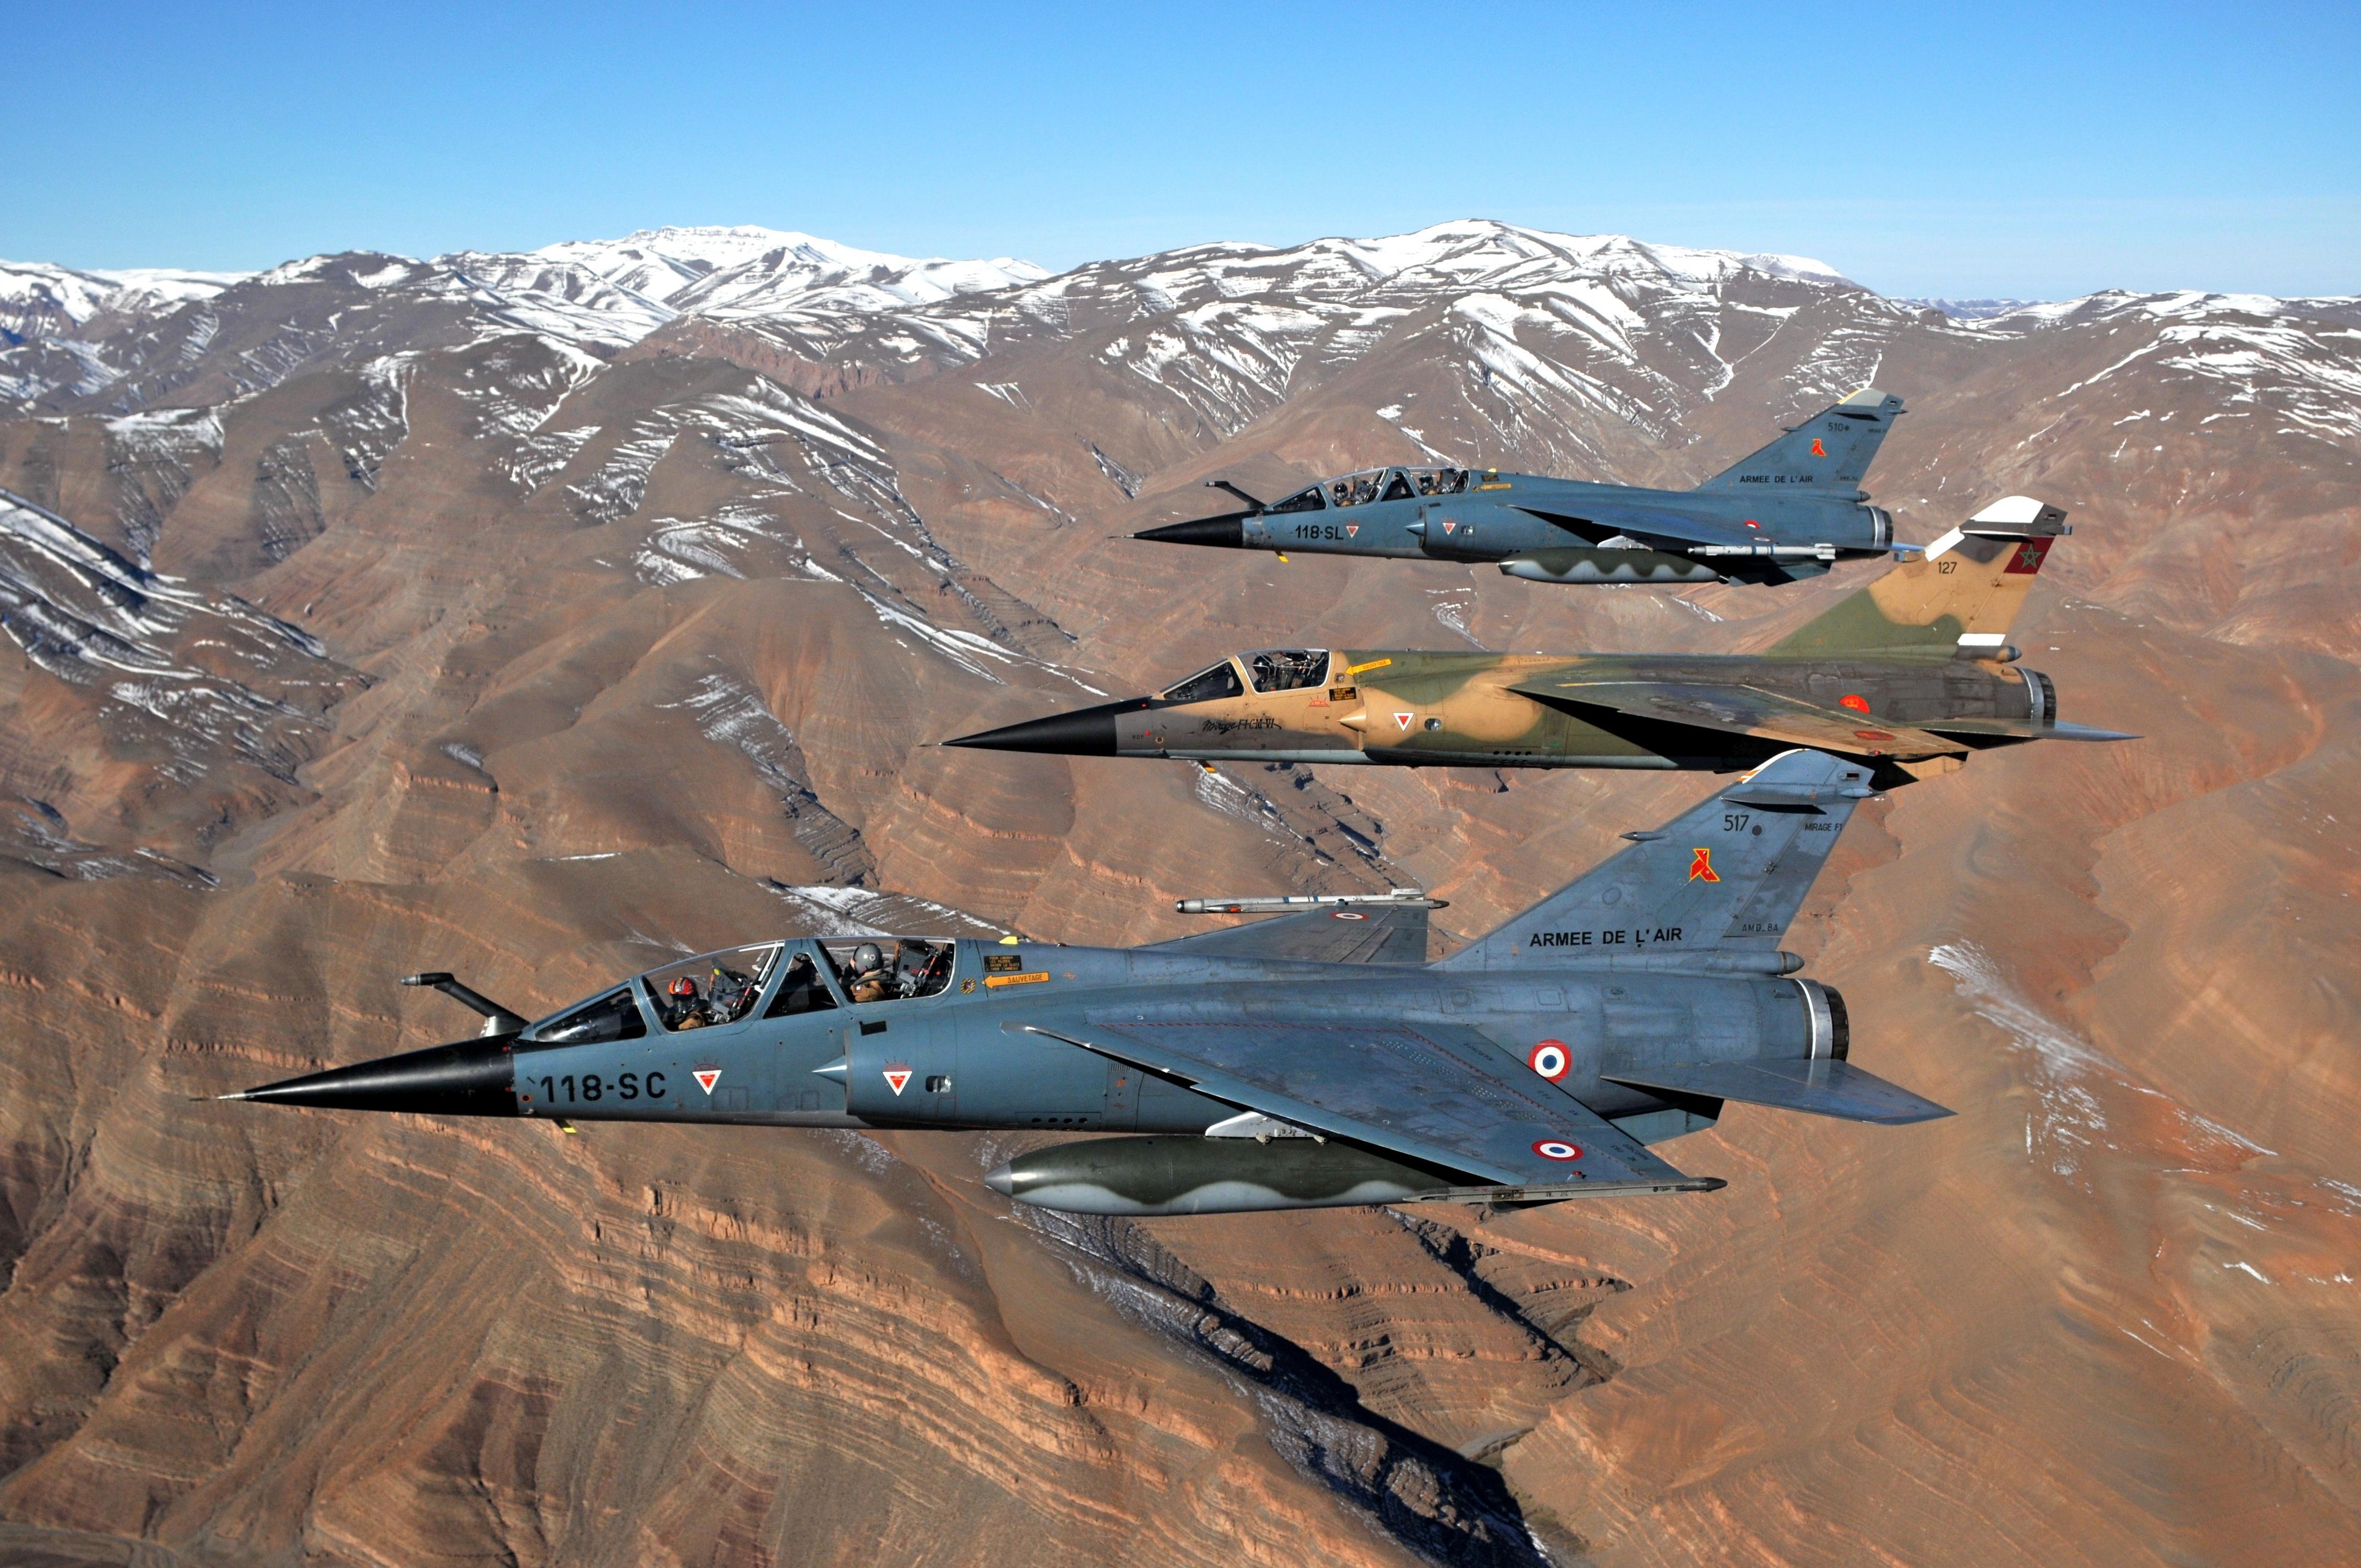 Echange franco-marocain 2012 38855258490_ce0b0619bf_o